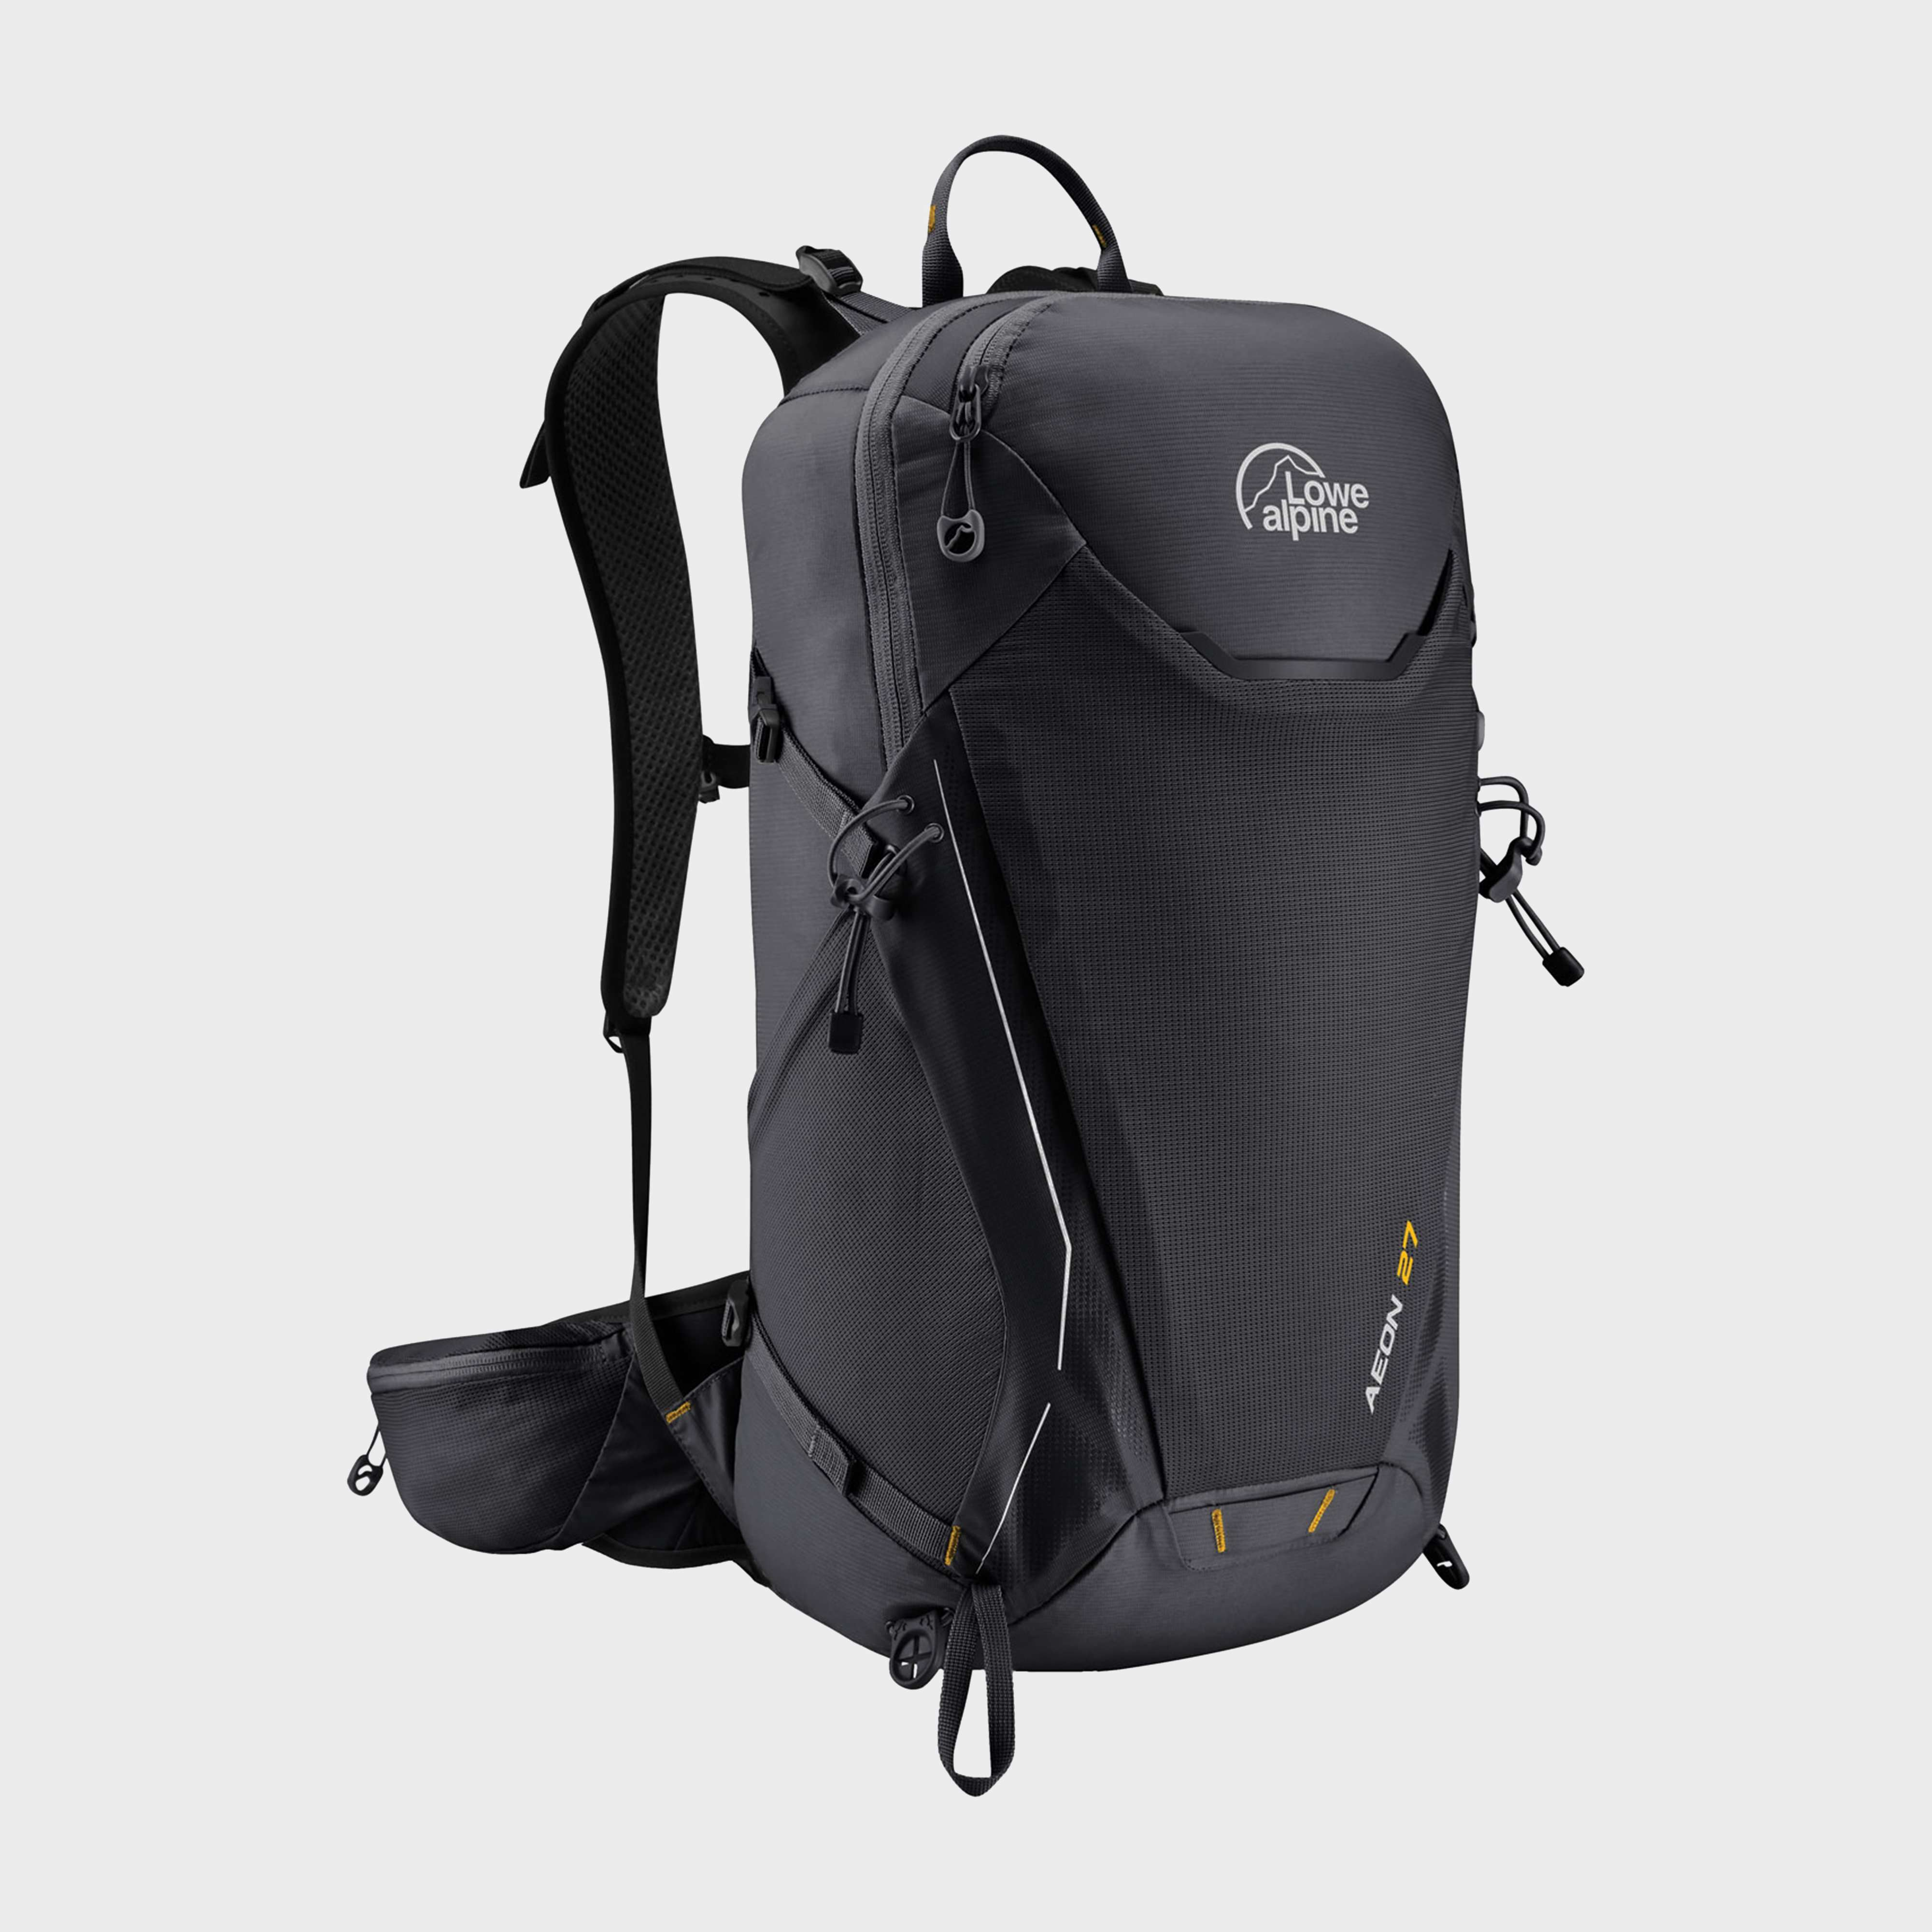 LOWE ALPINE Aeon 27L Daypack